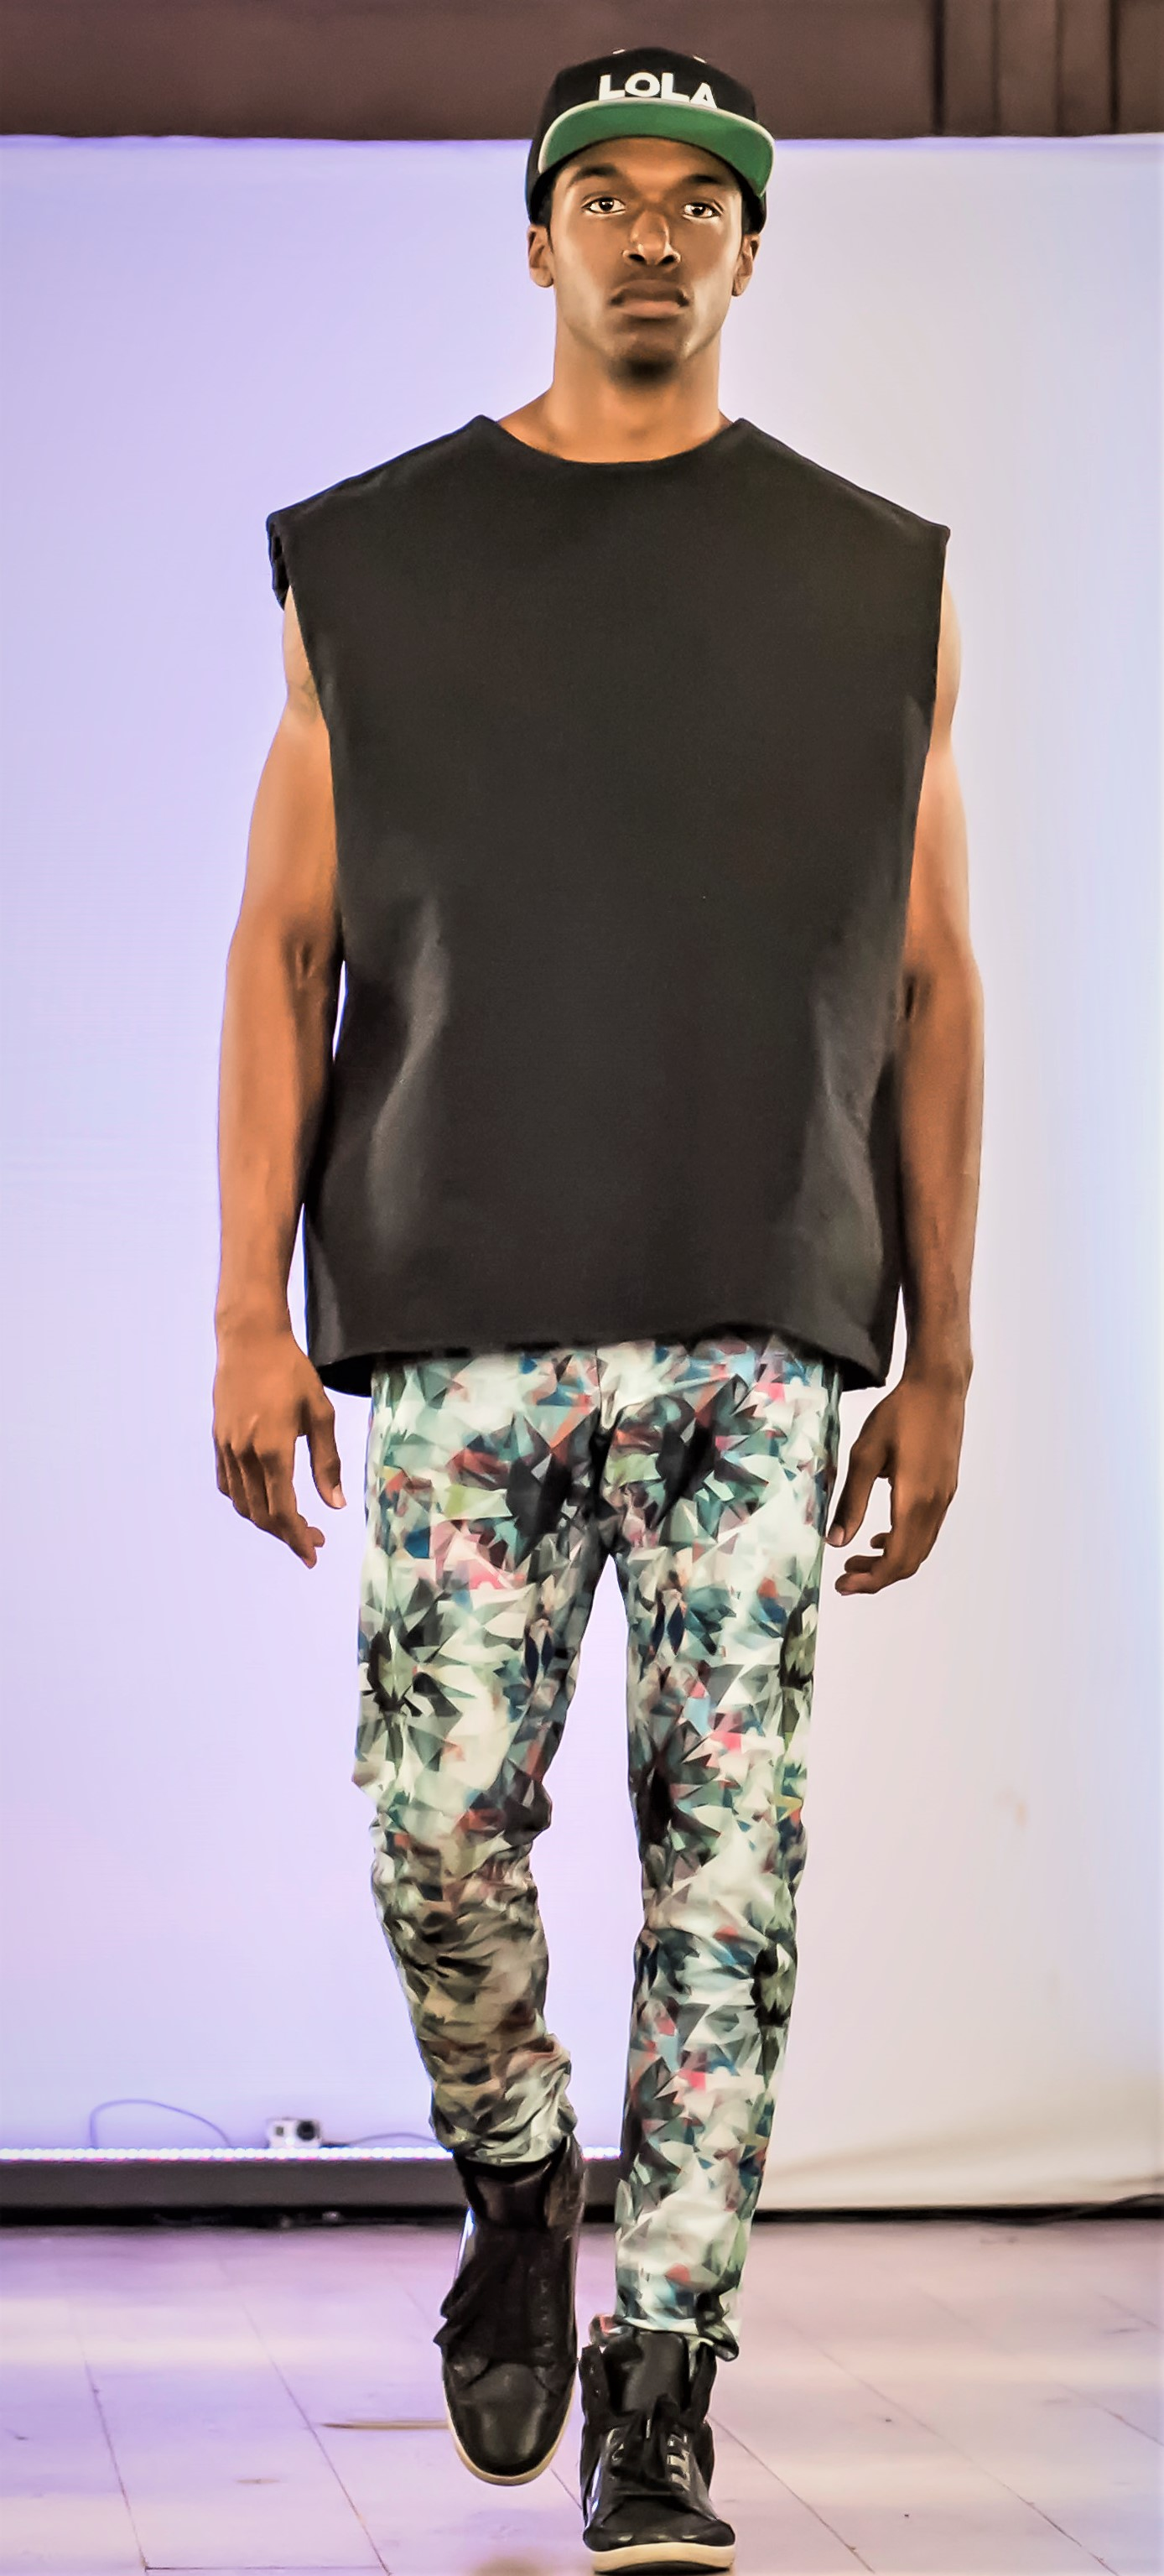 https://0201.nccdn.net/1_2/000/000/133/cc7/don_72ppi_2-fashion.jpg